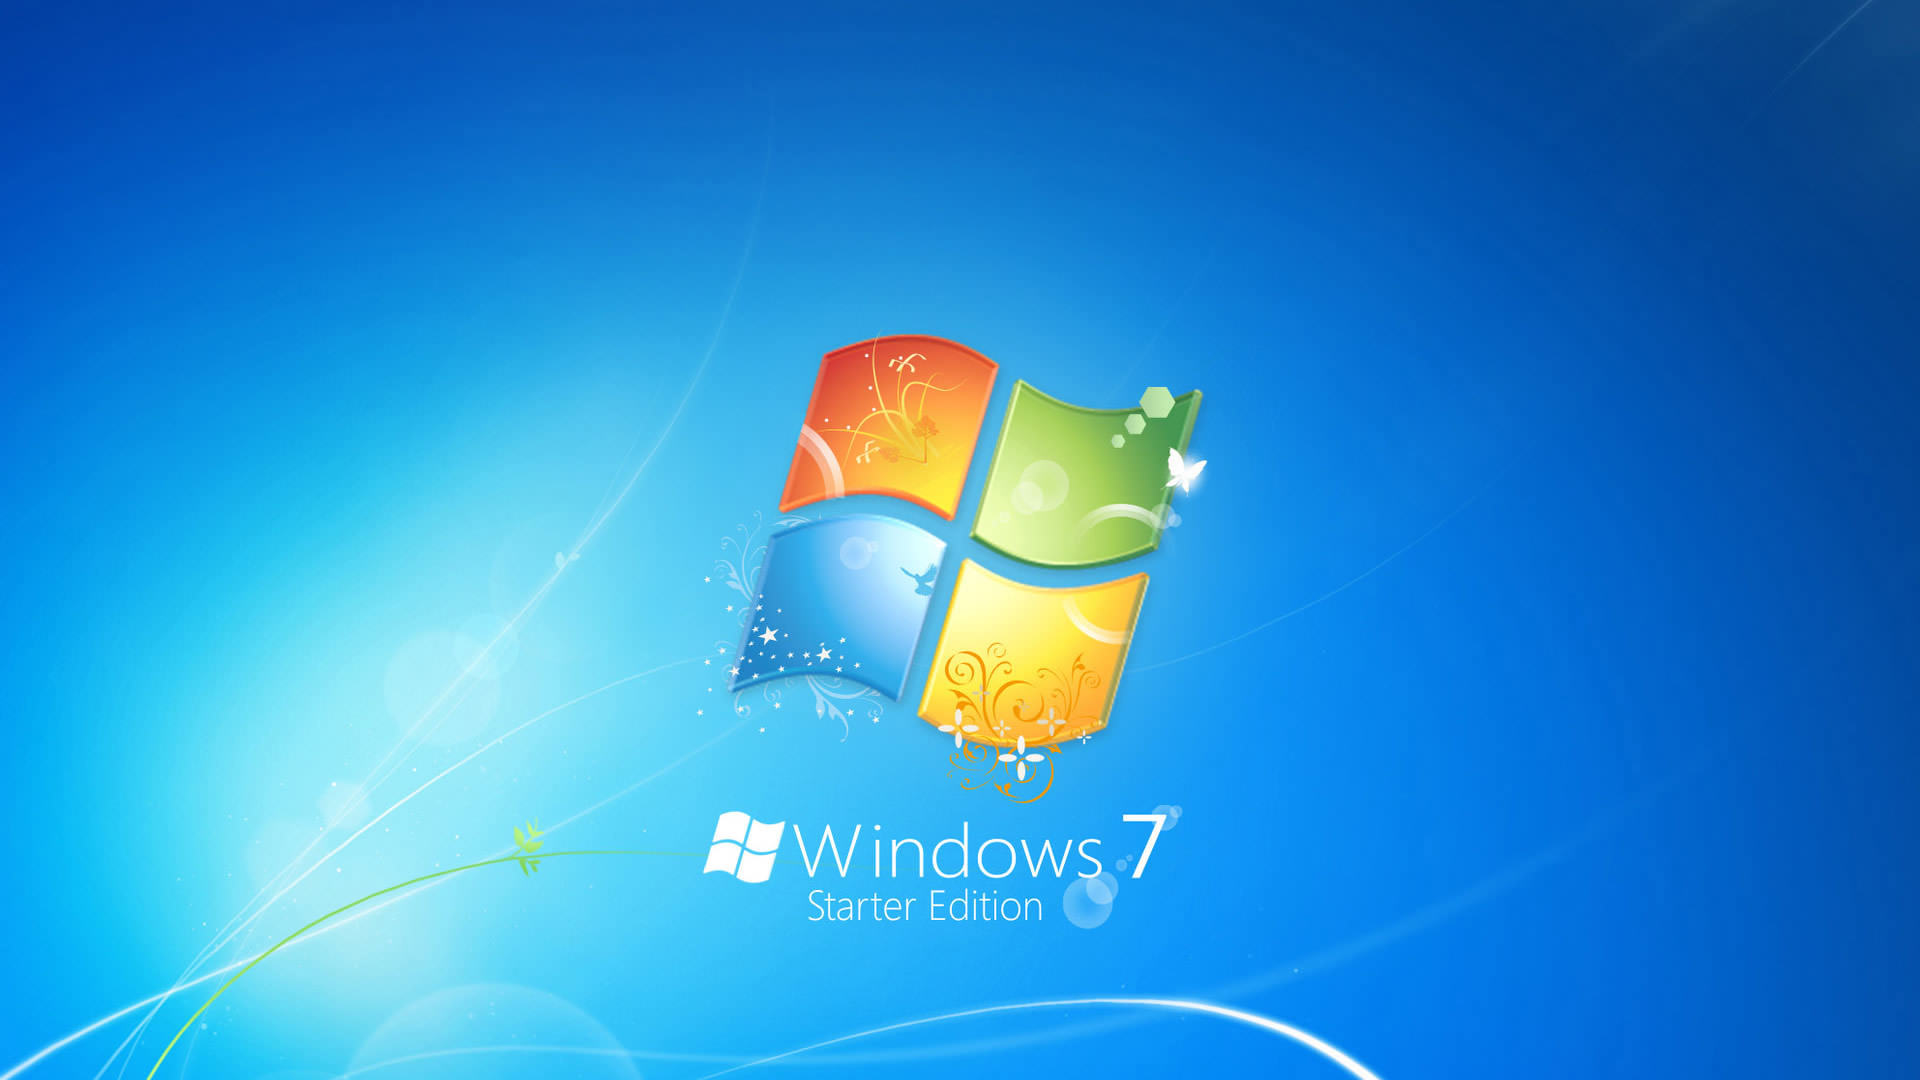 windows desktop wallpapers wallpaper background product 1920x1080 1920x1080